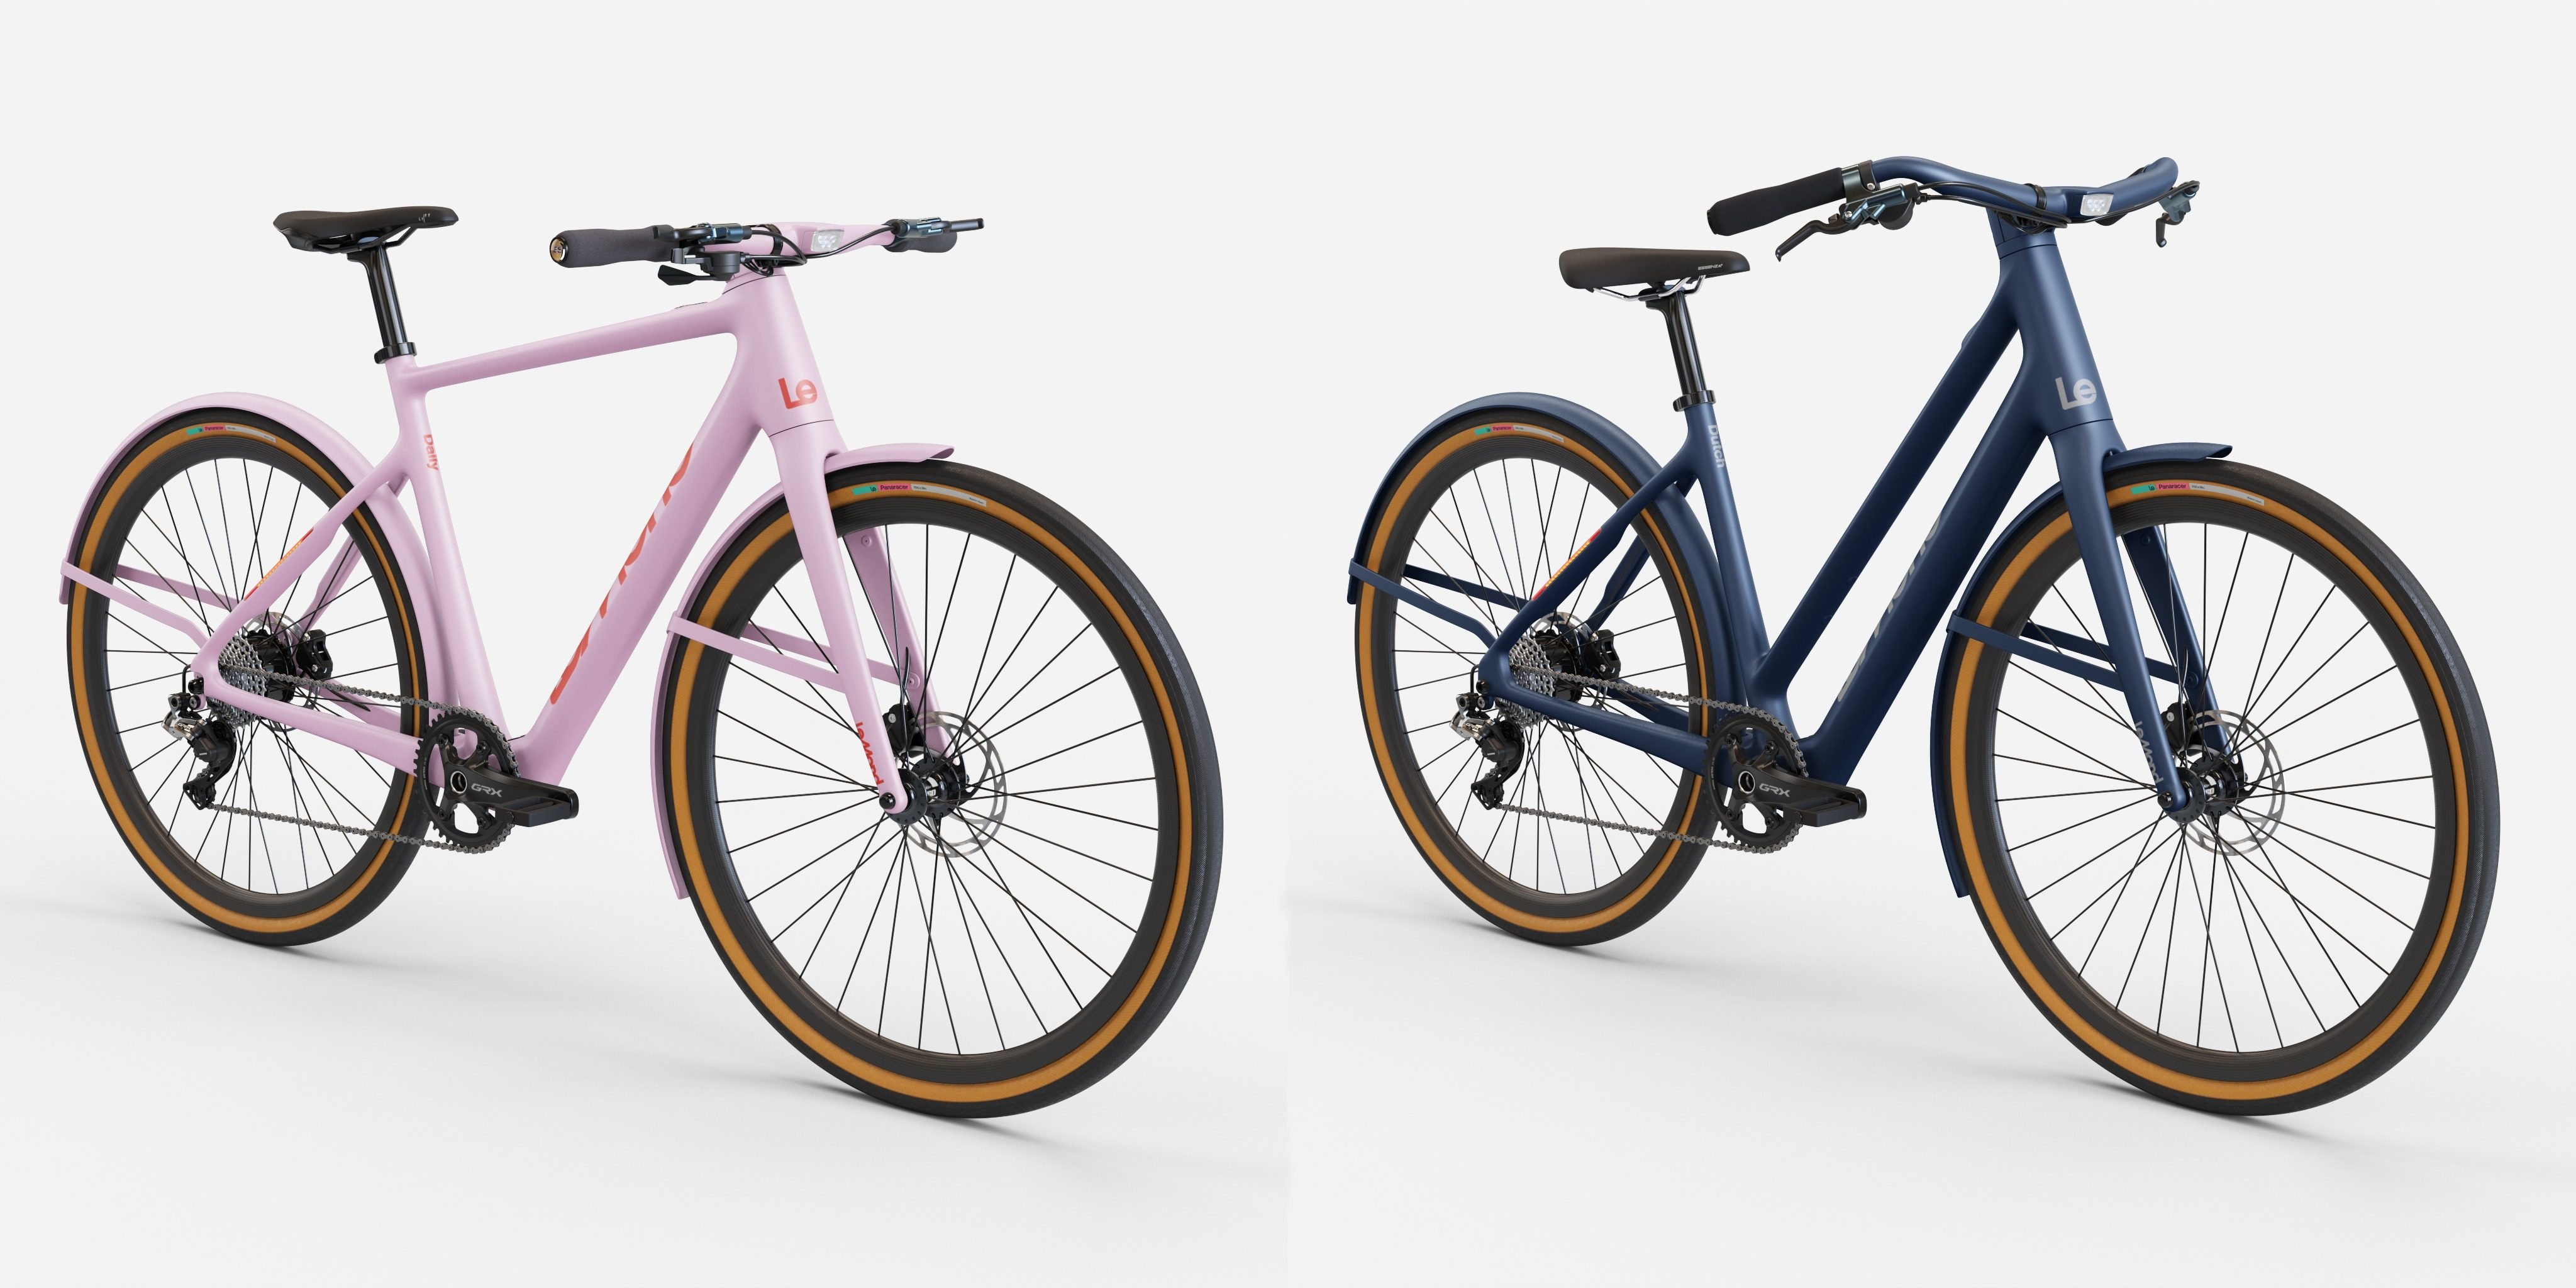 LeMond Daily and Dutch e-bikes released by 3x Tour de France winner